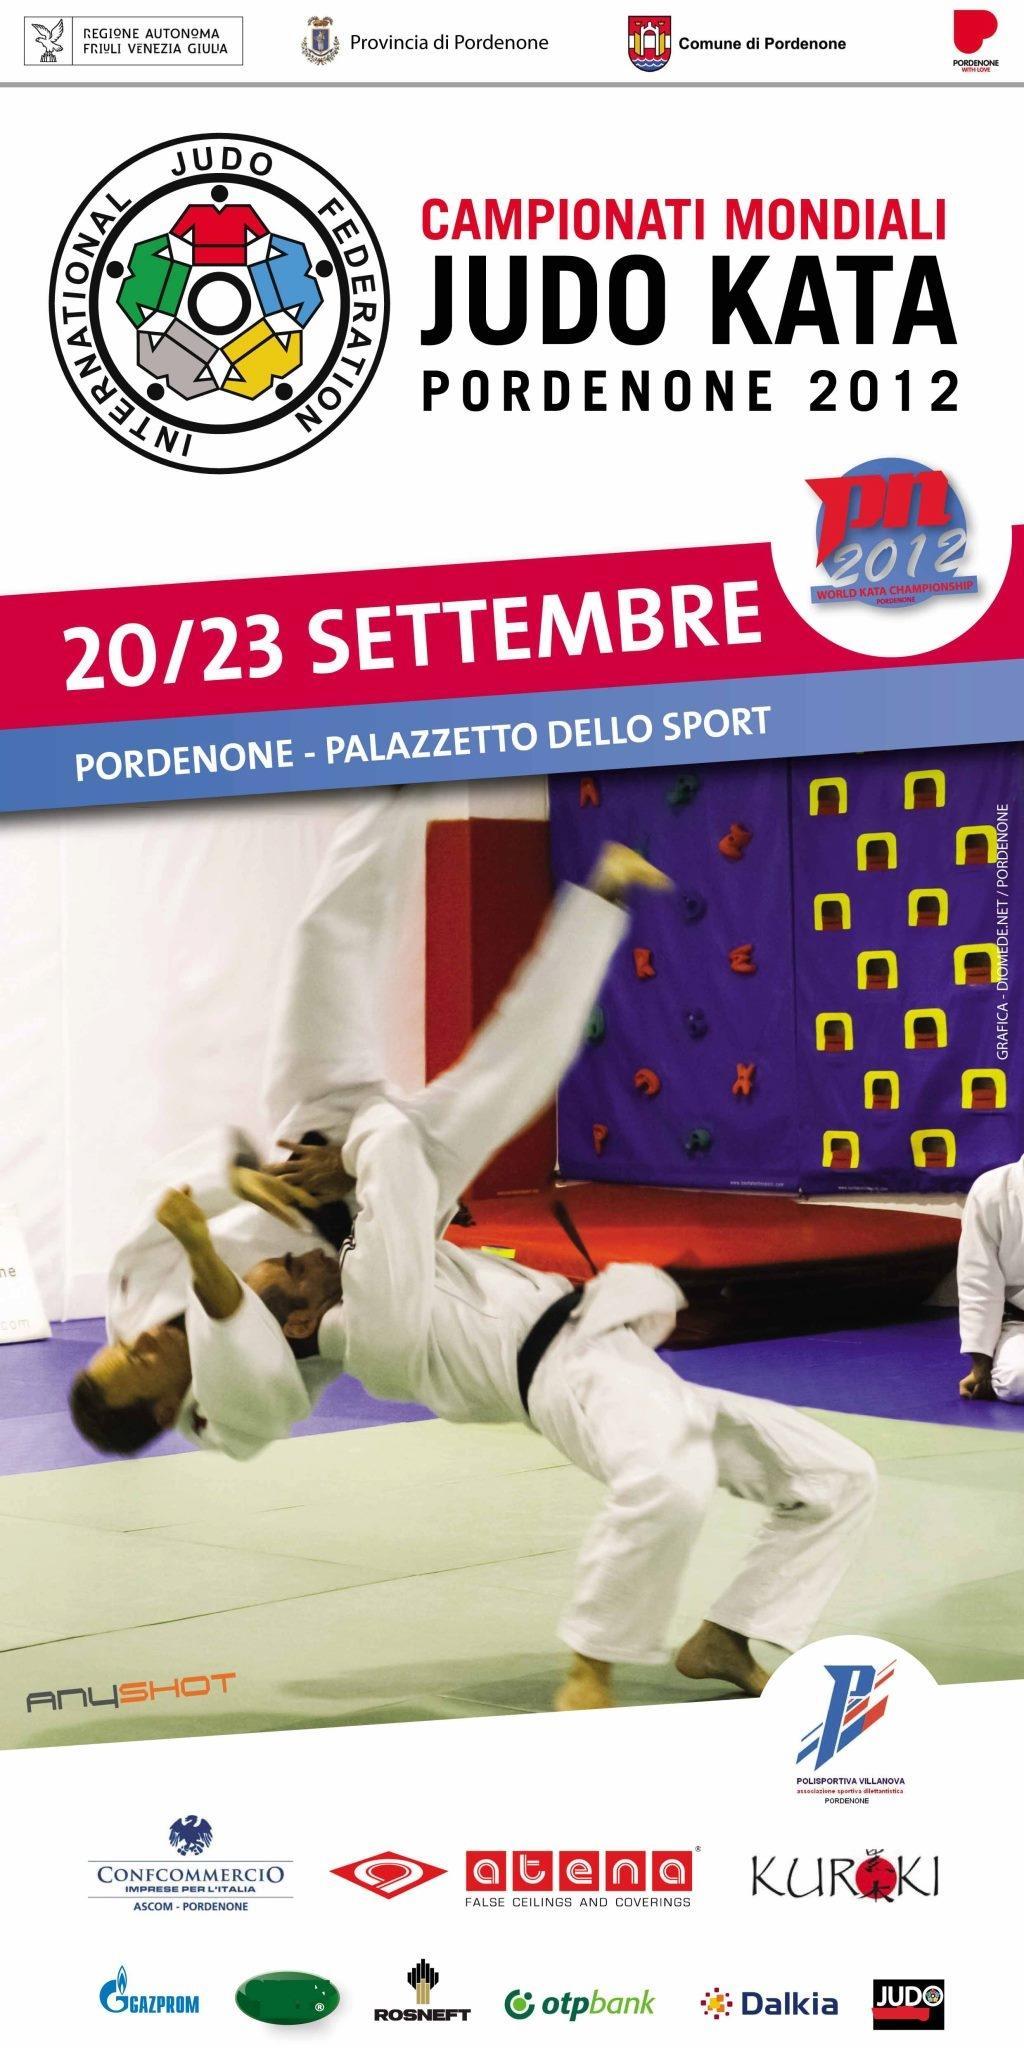 Website Kata World Championships in Pordenone online